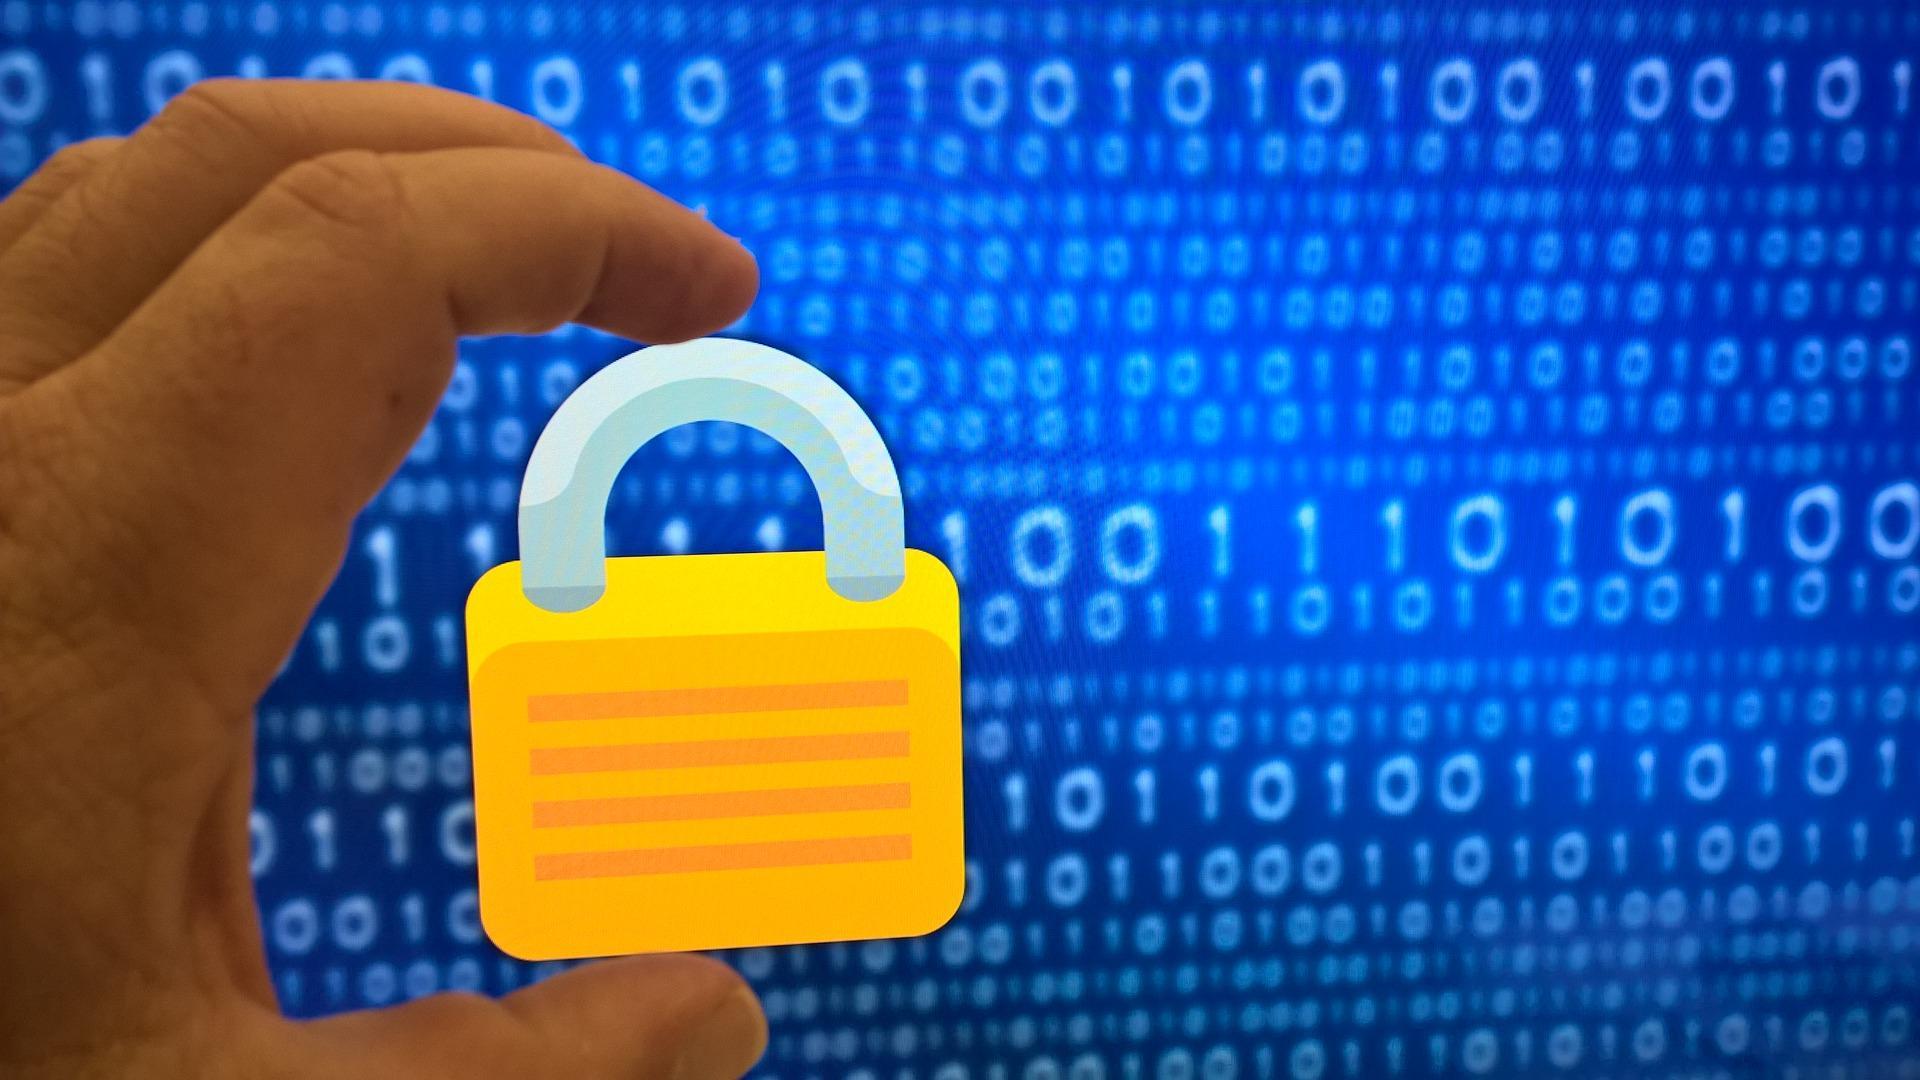 Deutsches Datenschutzrecht bei Facebook?